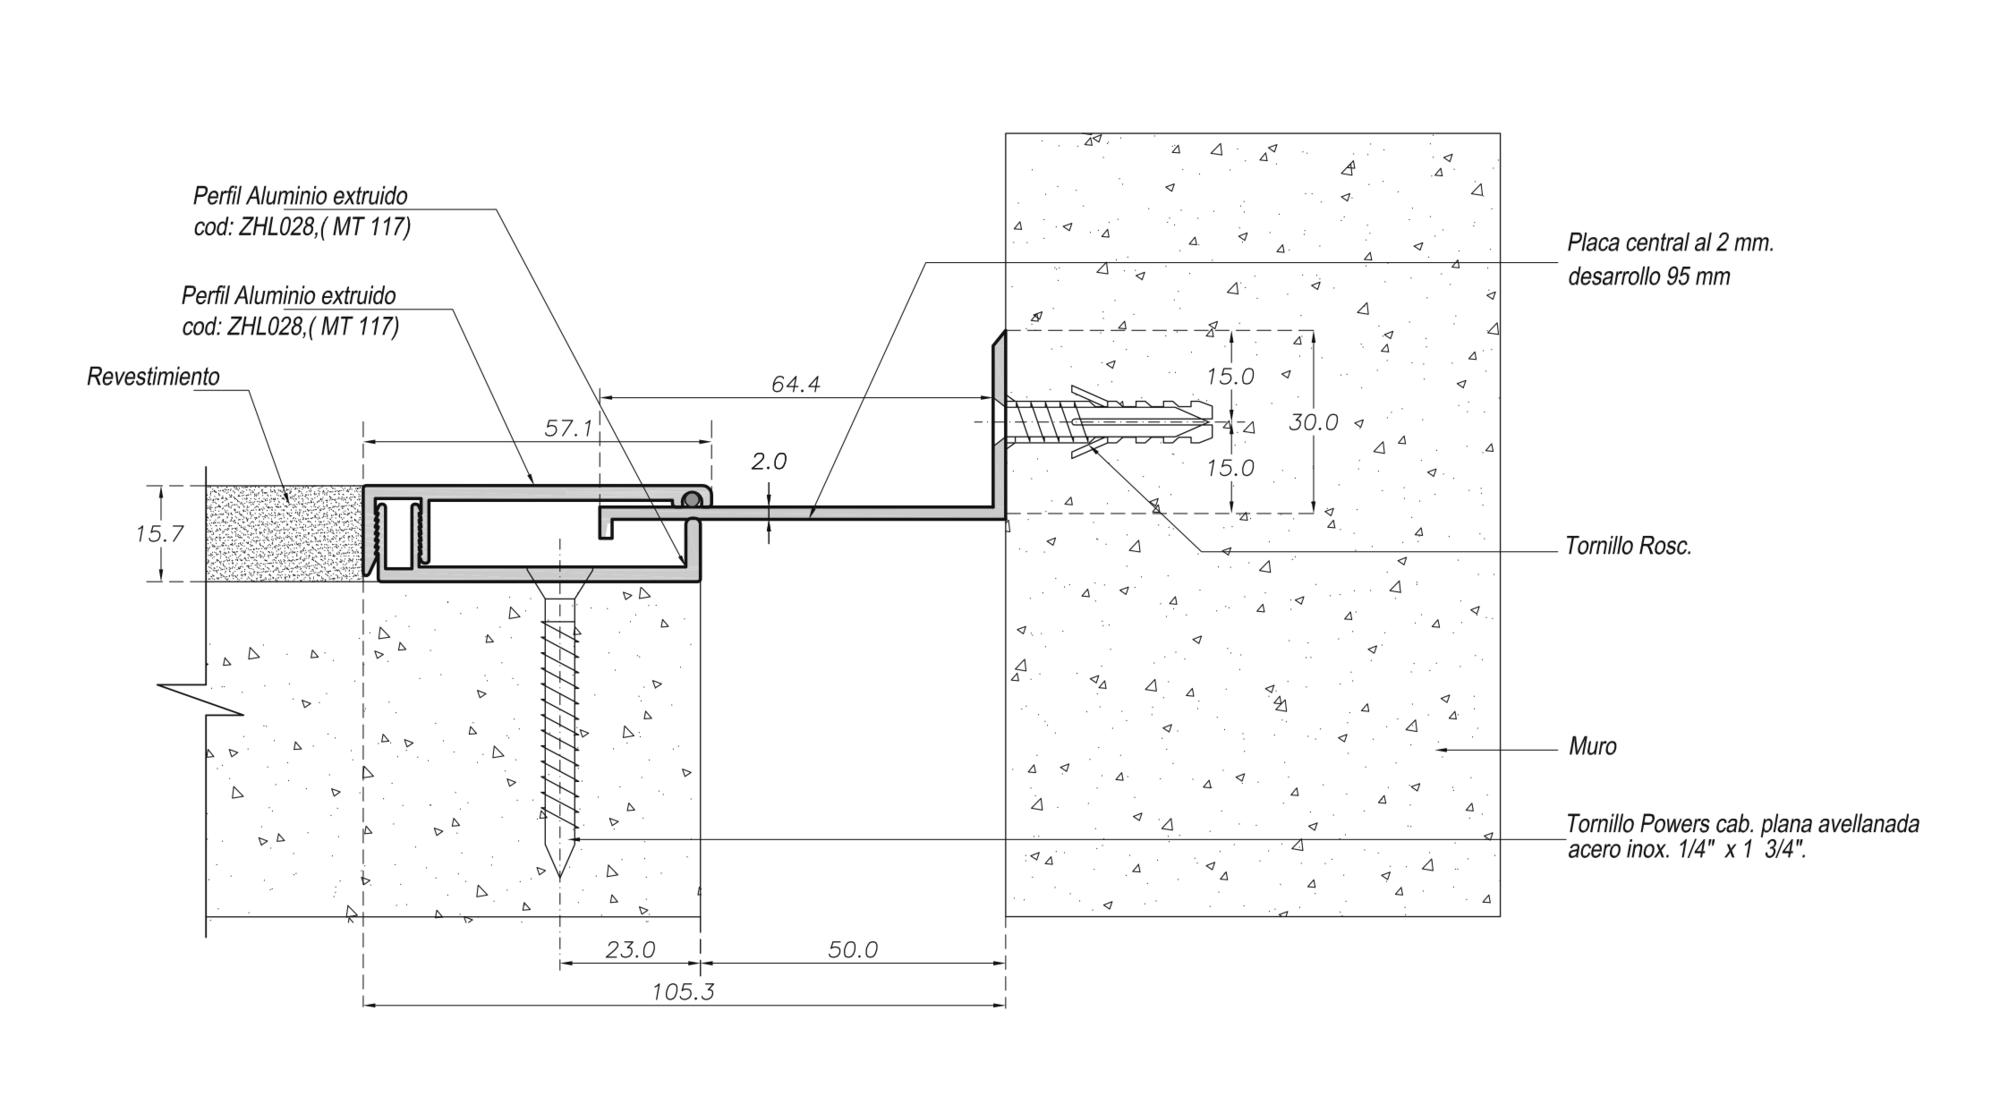 Cubrejunta Muro Aluminio Esquina (CMAL) / Sysprotec